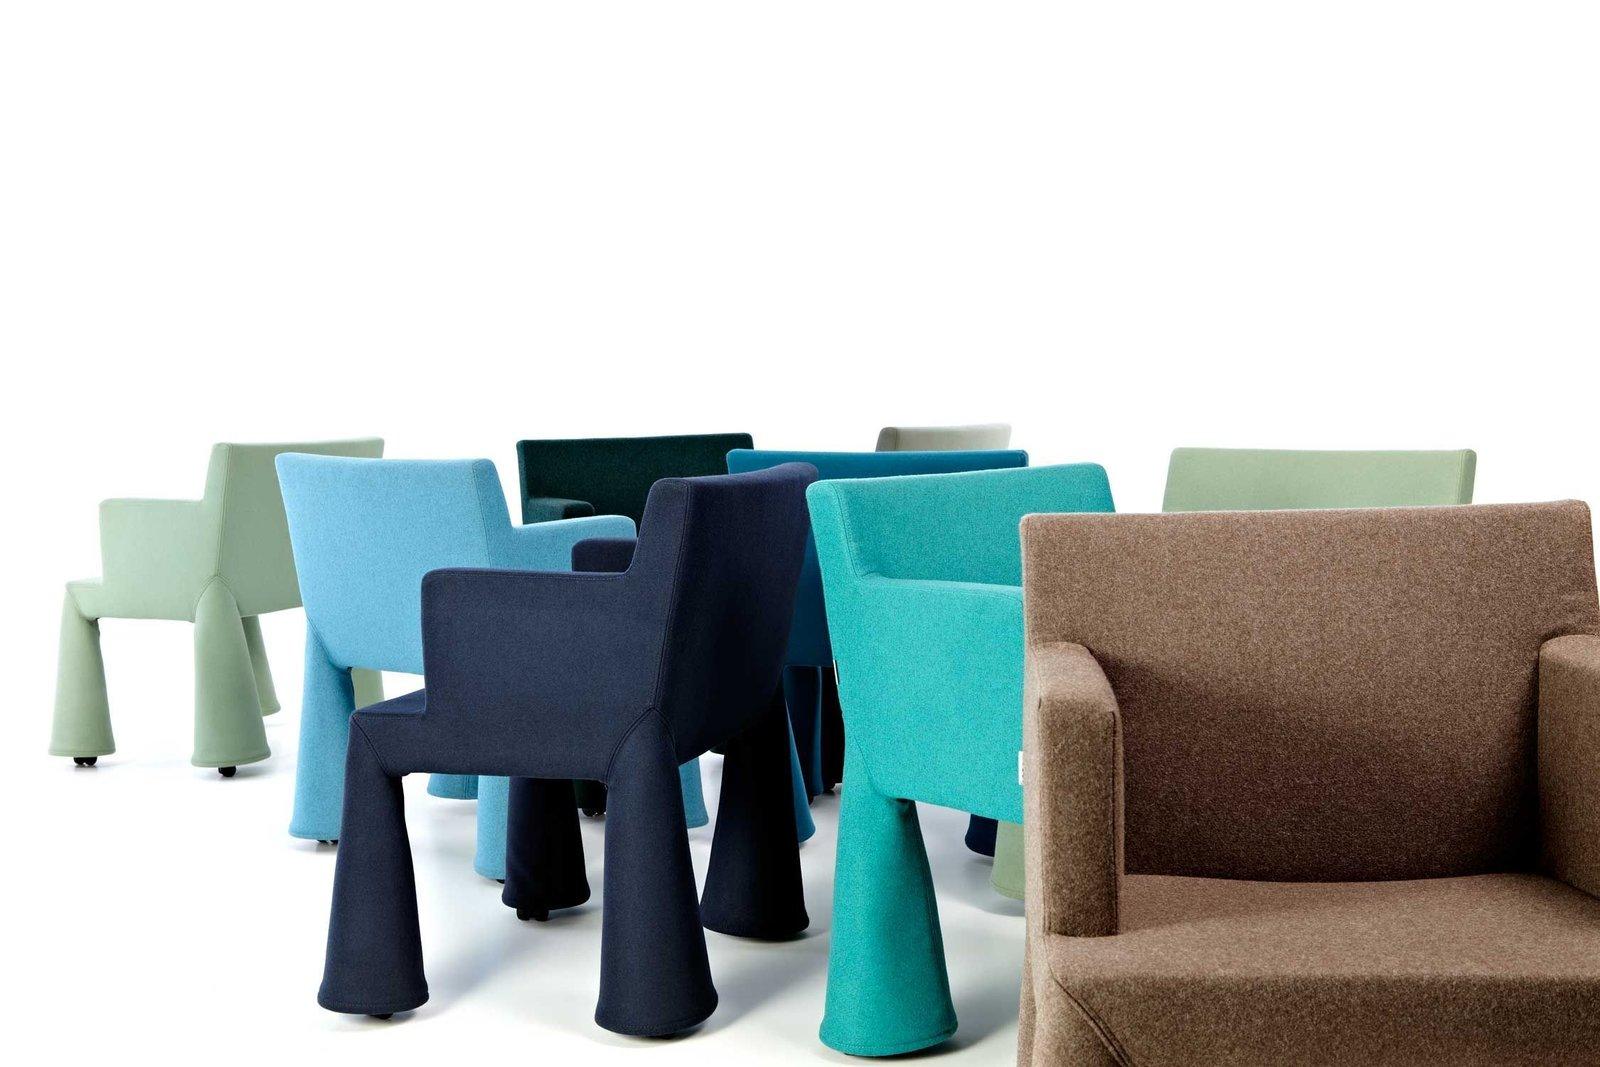 "V.I.P. Chair by Marcel Wanders  ∙ moooi  Search ""김포출장마사지-출장안마-출장-출장서비스 김포콜걸 출장샵 주소ㅋr톡BC388 주소[sannhu222,vip] 김포 출장여대생 만남 출장만남 업소 타이마사지 출장샵추천 업소  김포출장샵 출장서비스 출장업소"""